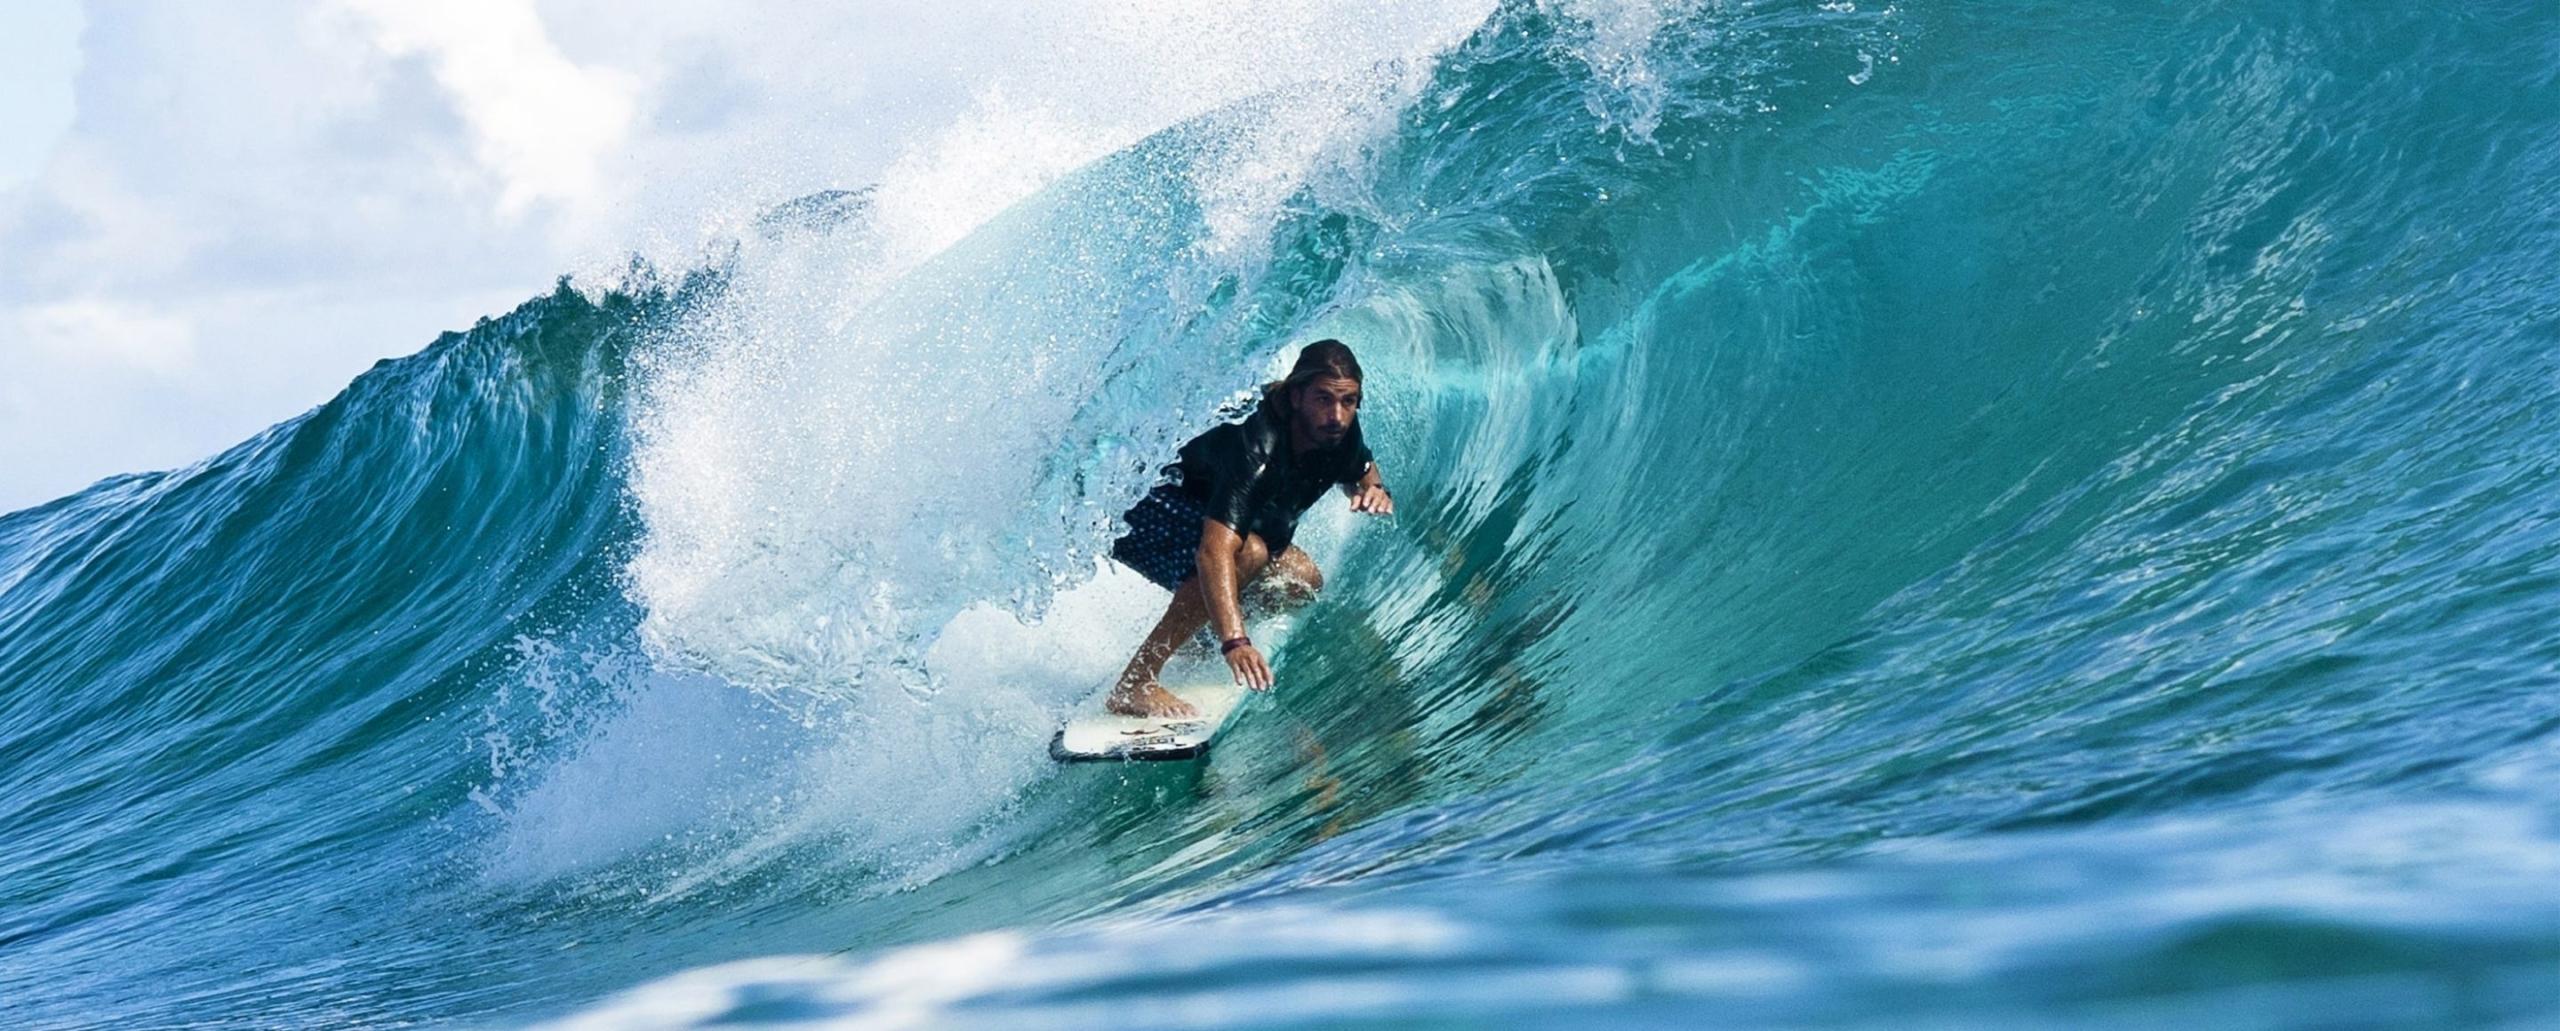 AMBASSADEUR COVER Picture Damien Castera athlète surf